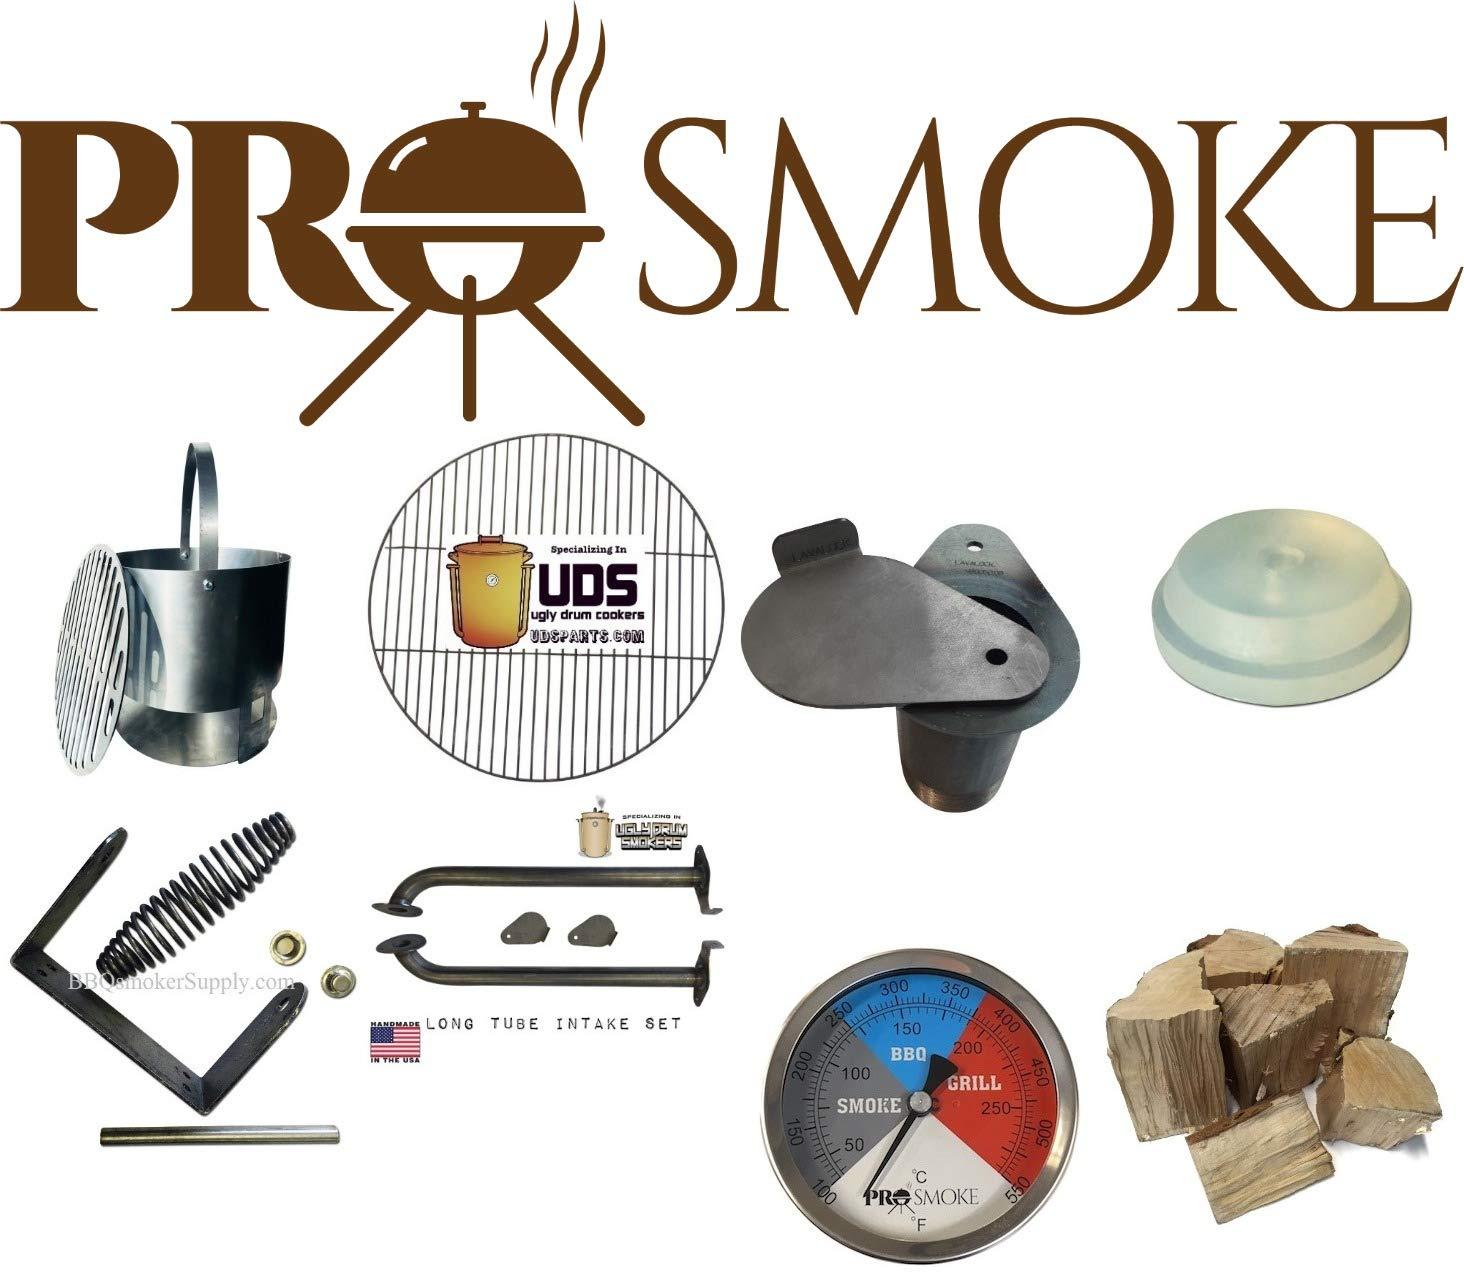 Kit Profesional de Fumador de Tambor Feo (UDS), Pro Smoke BBQ ...